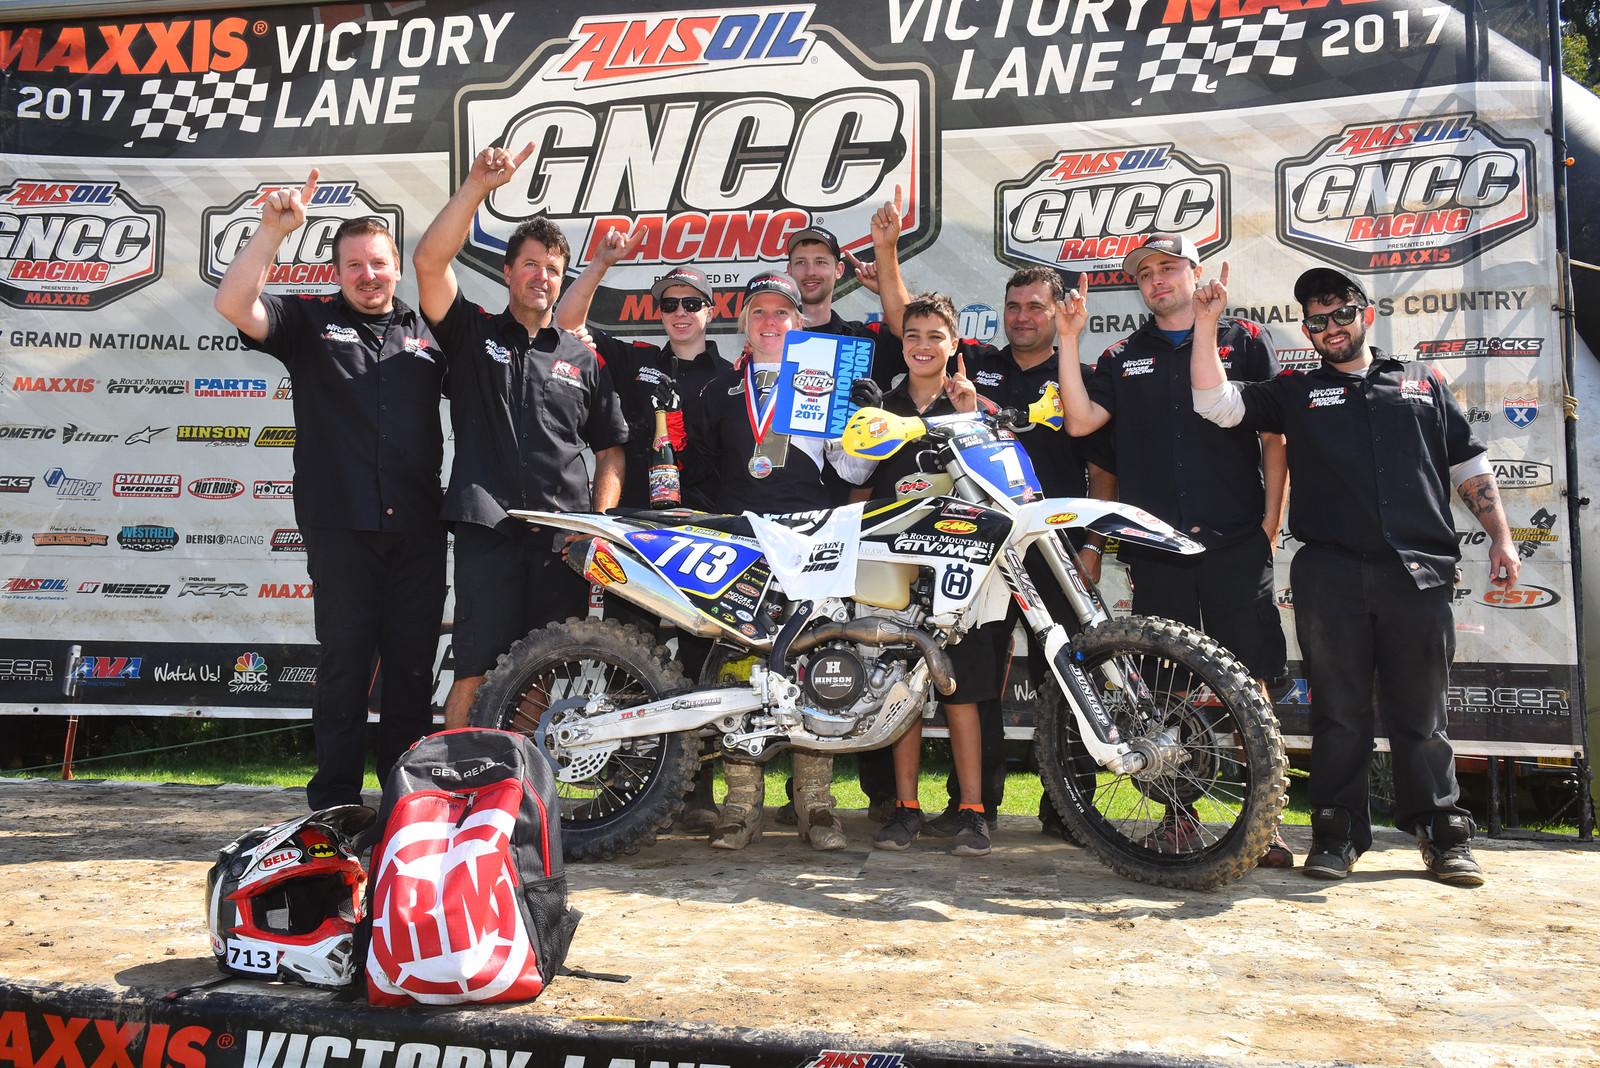 Tayla Jones Wins The 2017 GNCC Championship